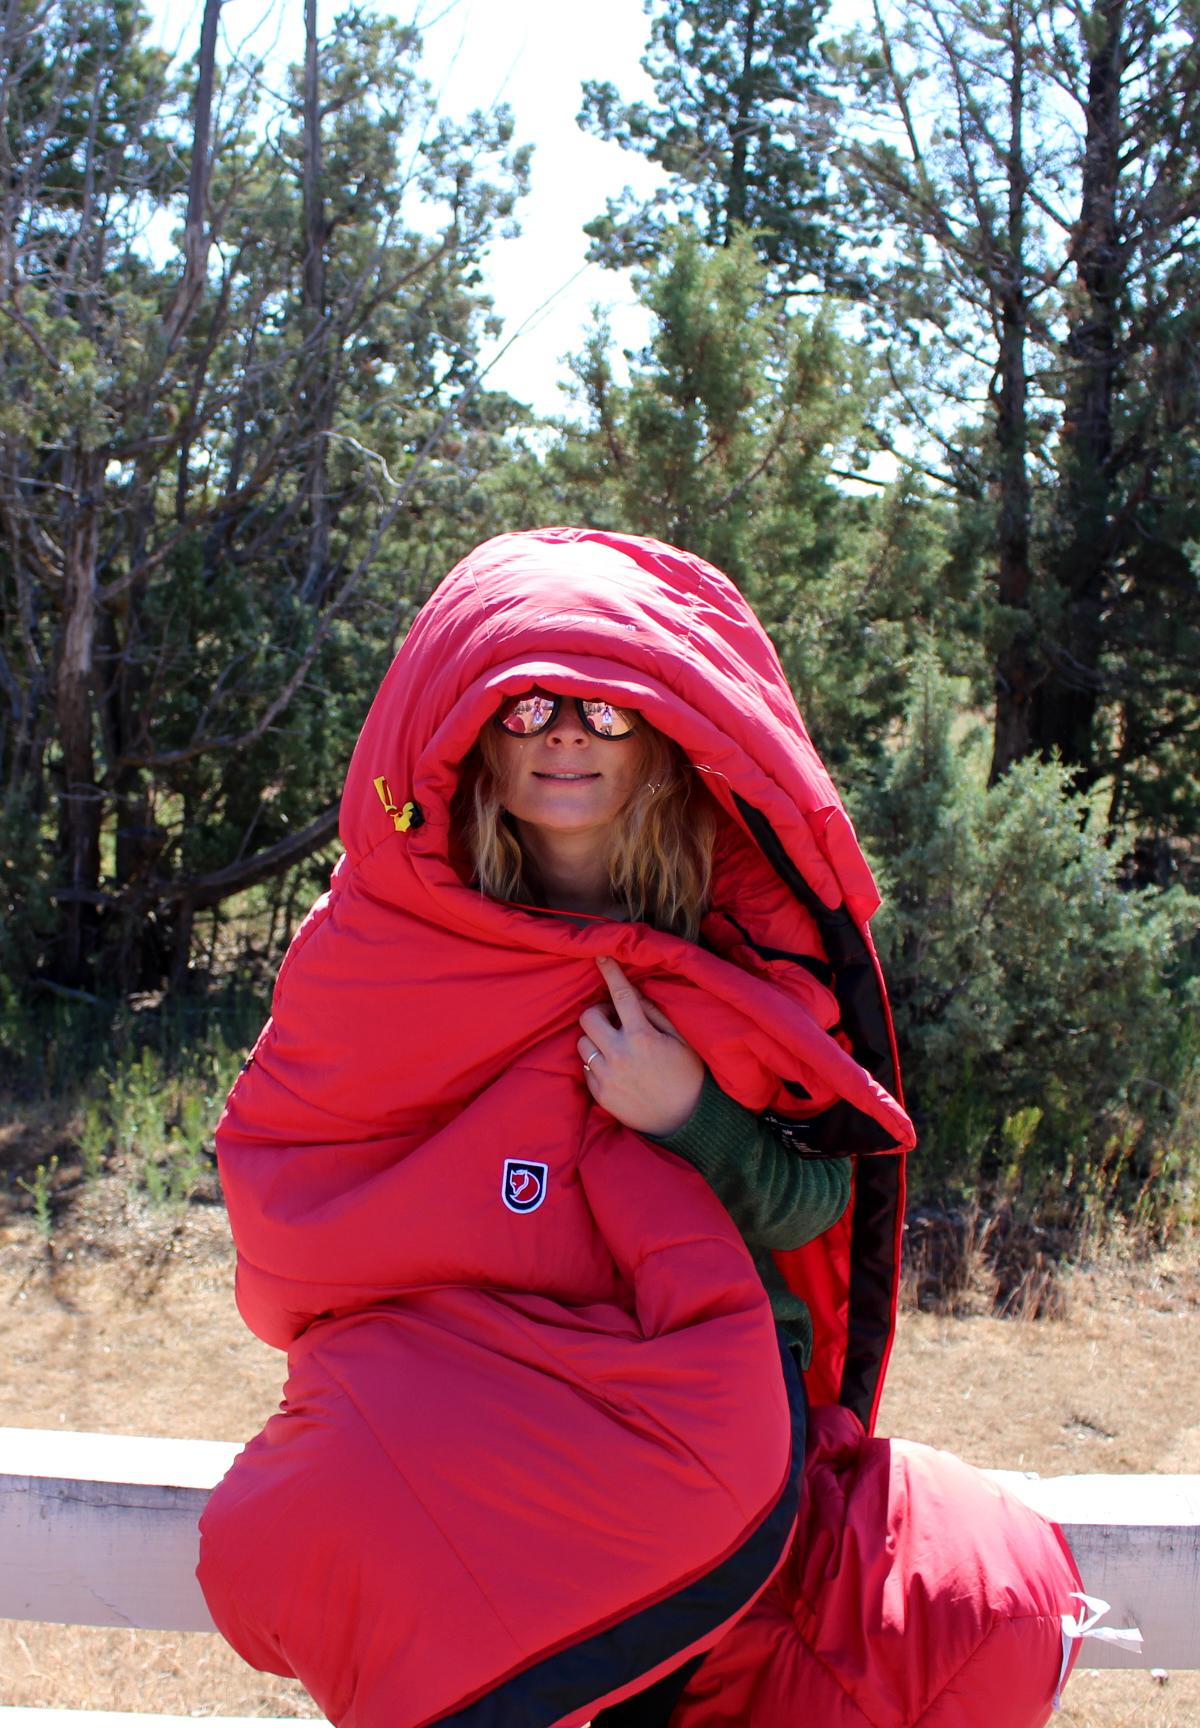 maybeyoulike_camping_gear4